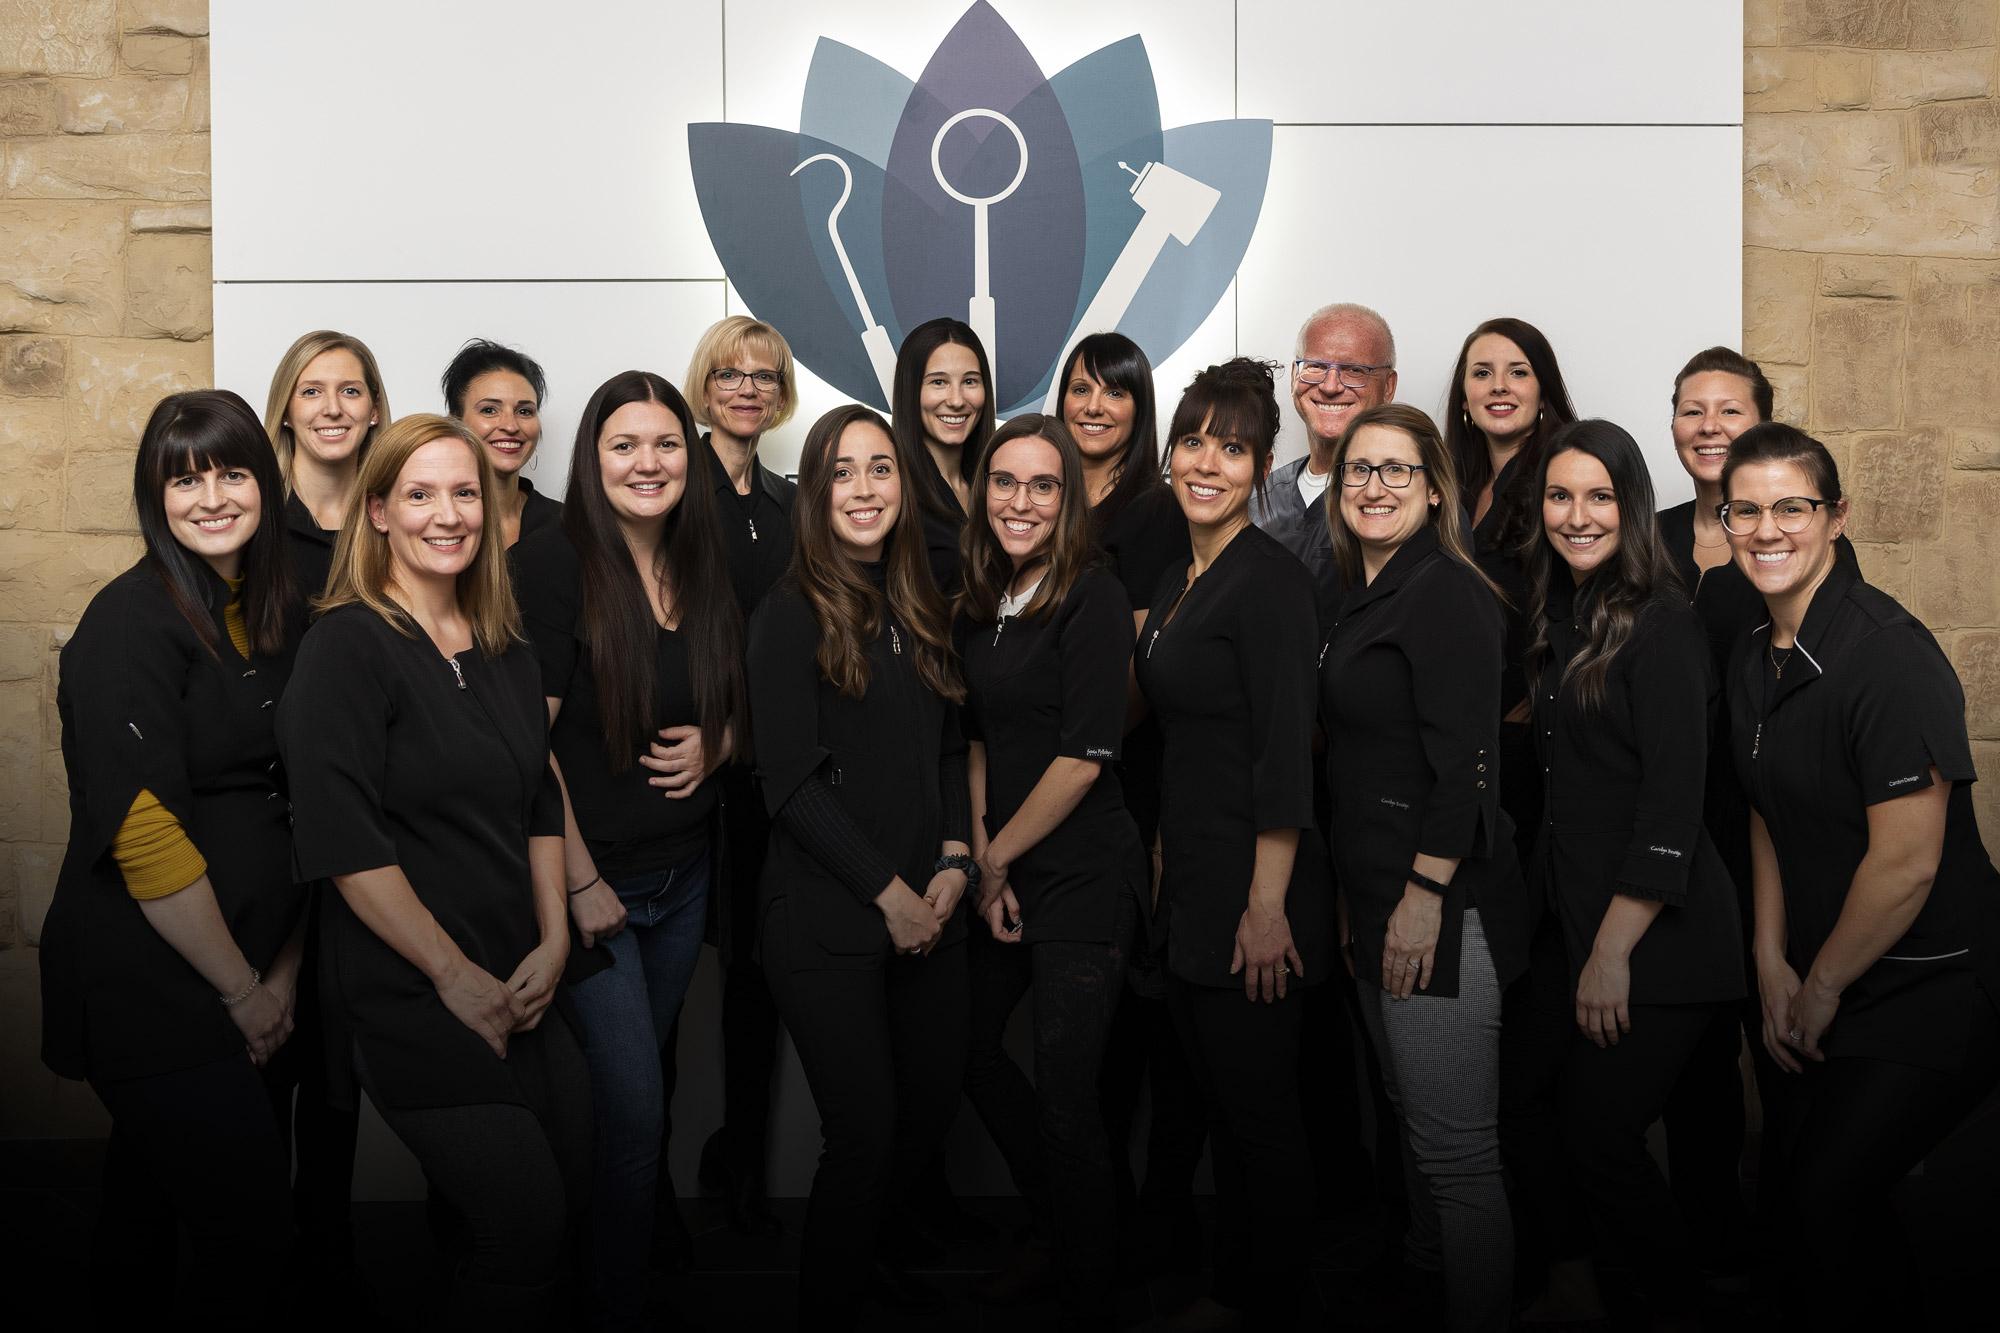 Centre dentaire Drummond - Notre équipe